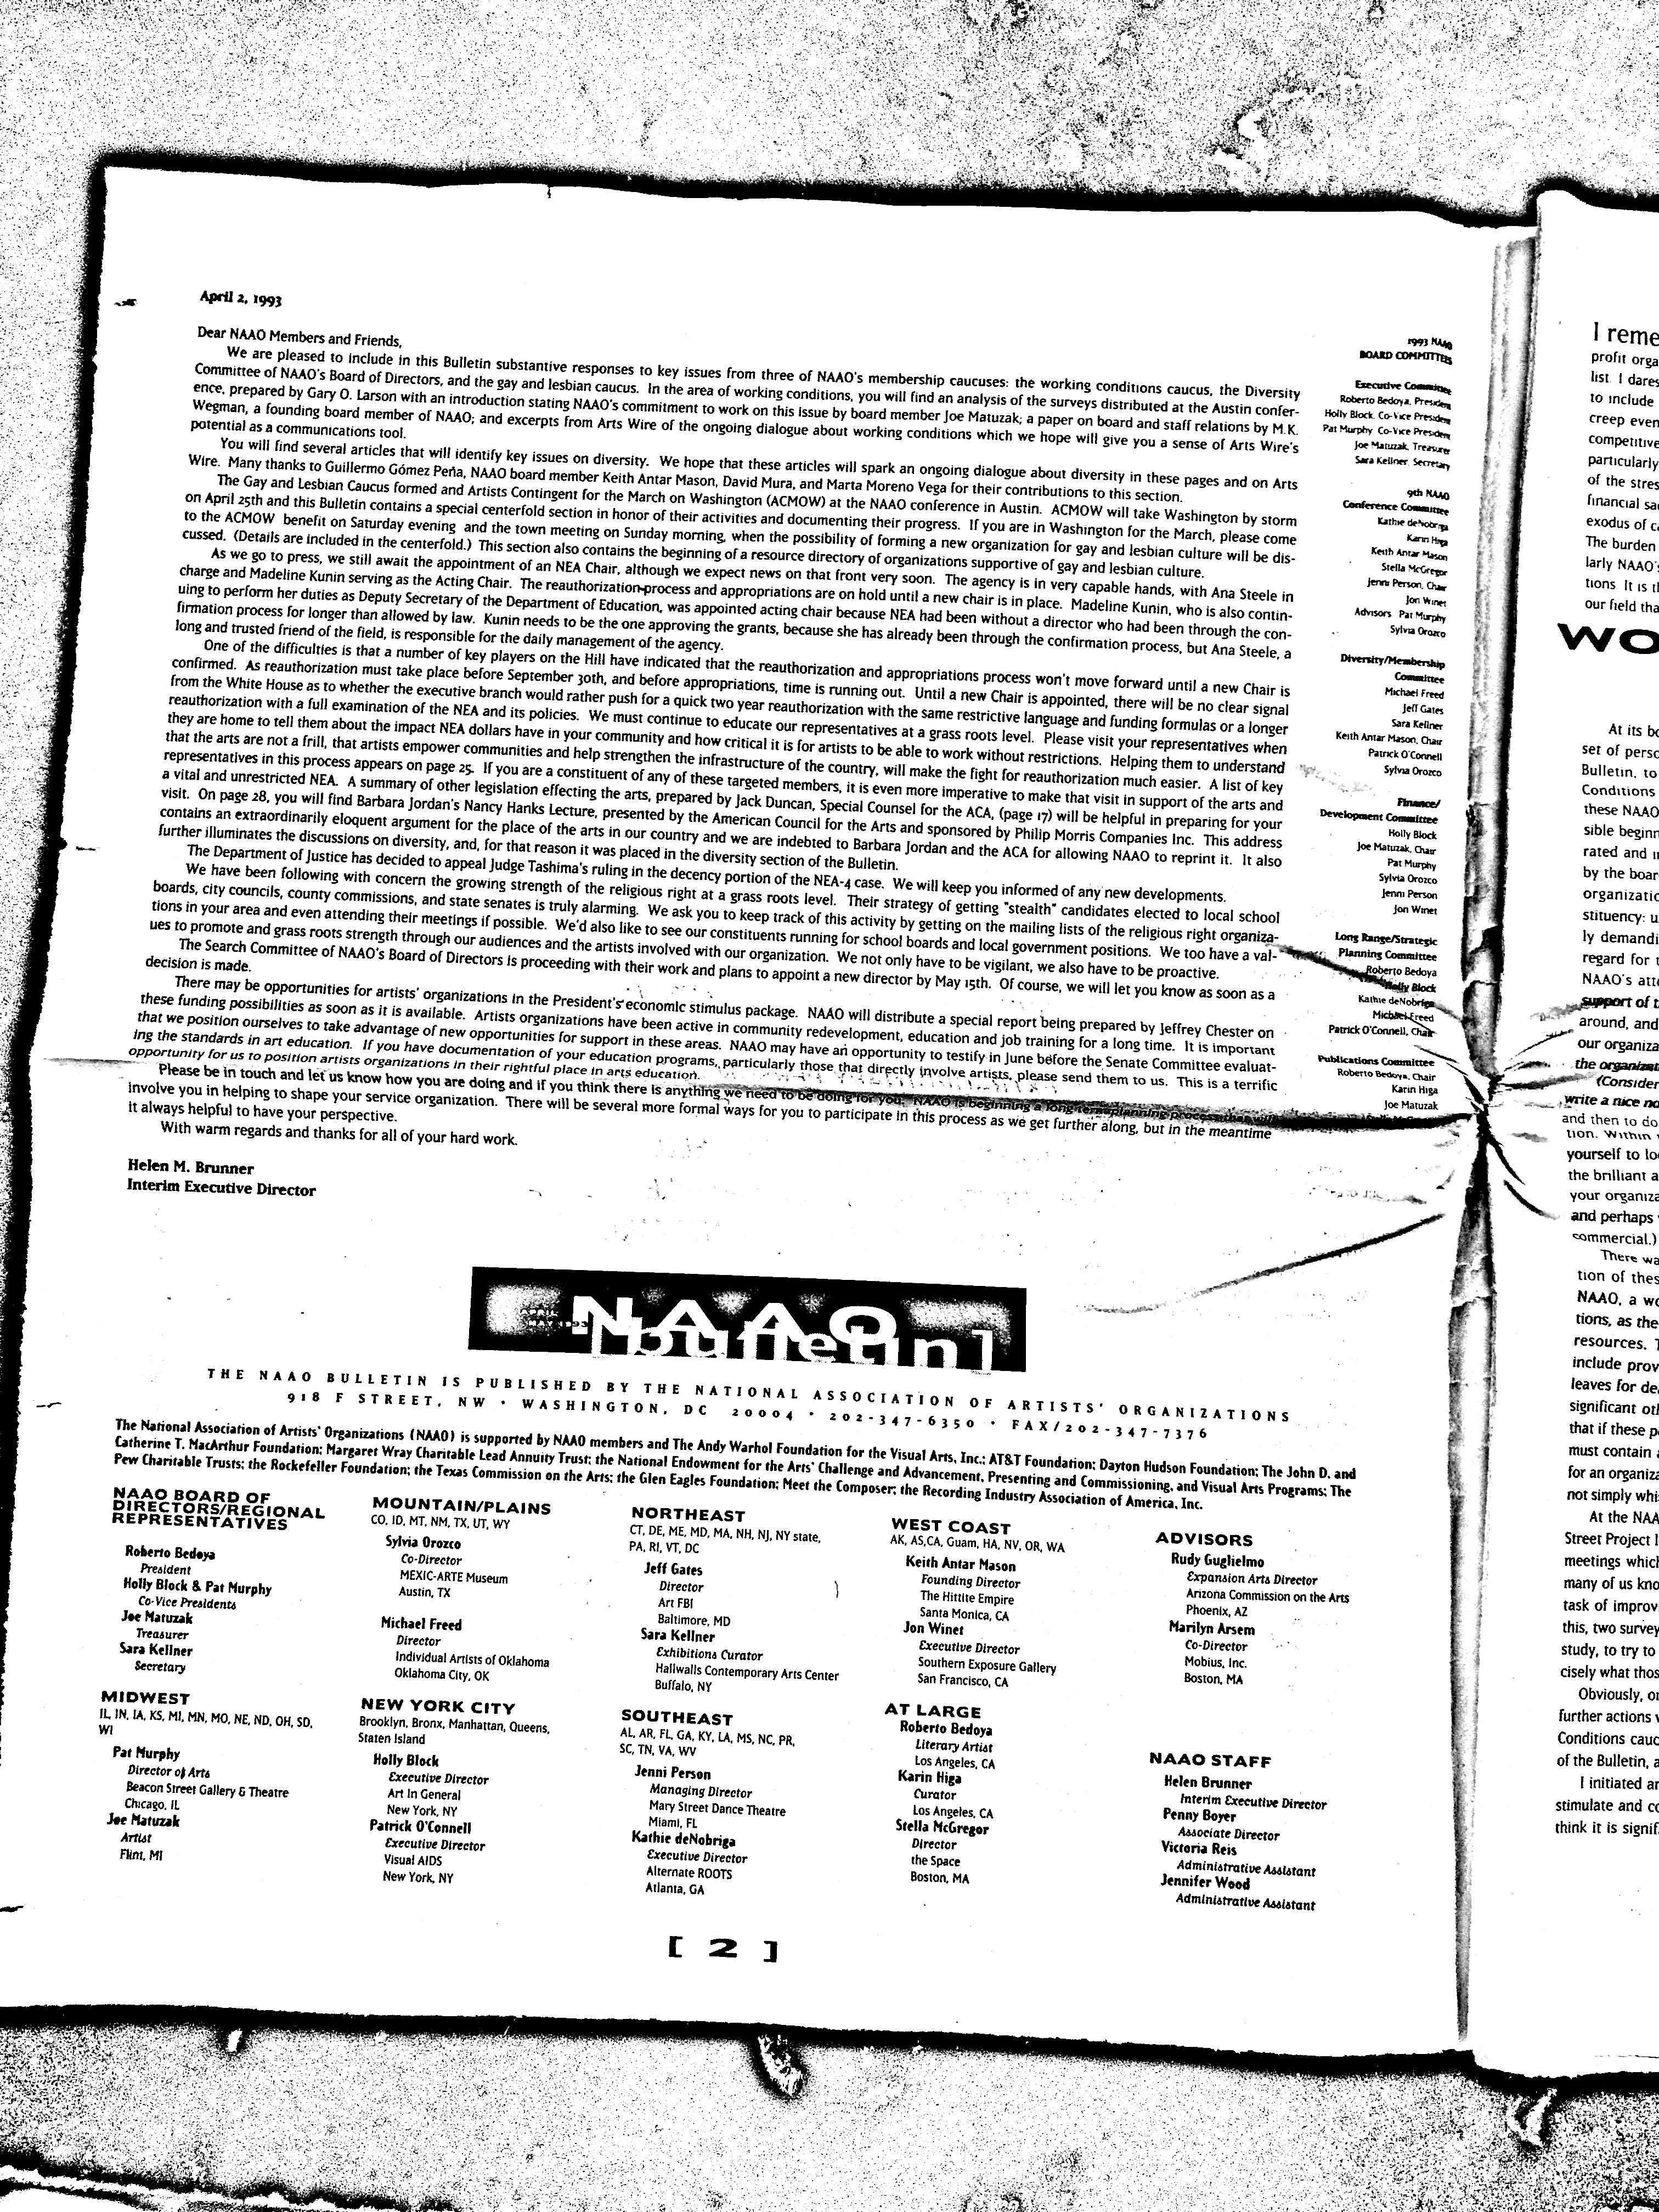 April 1993 - NAAO Bulletin Page 2.jpg